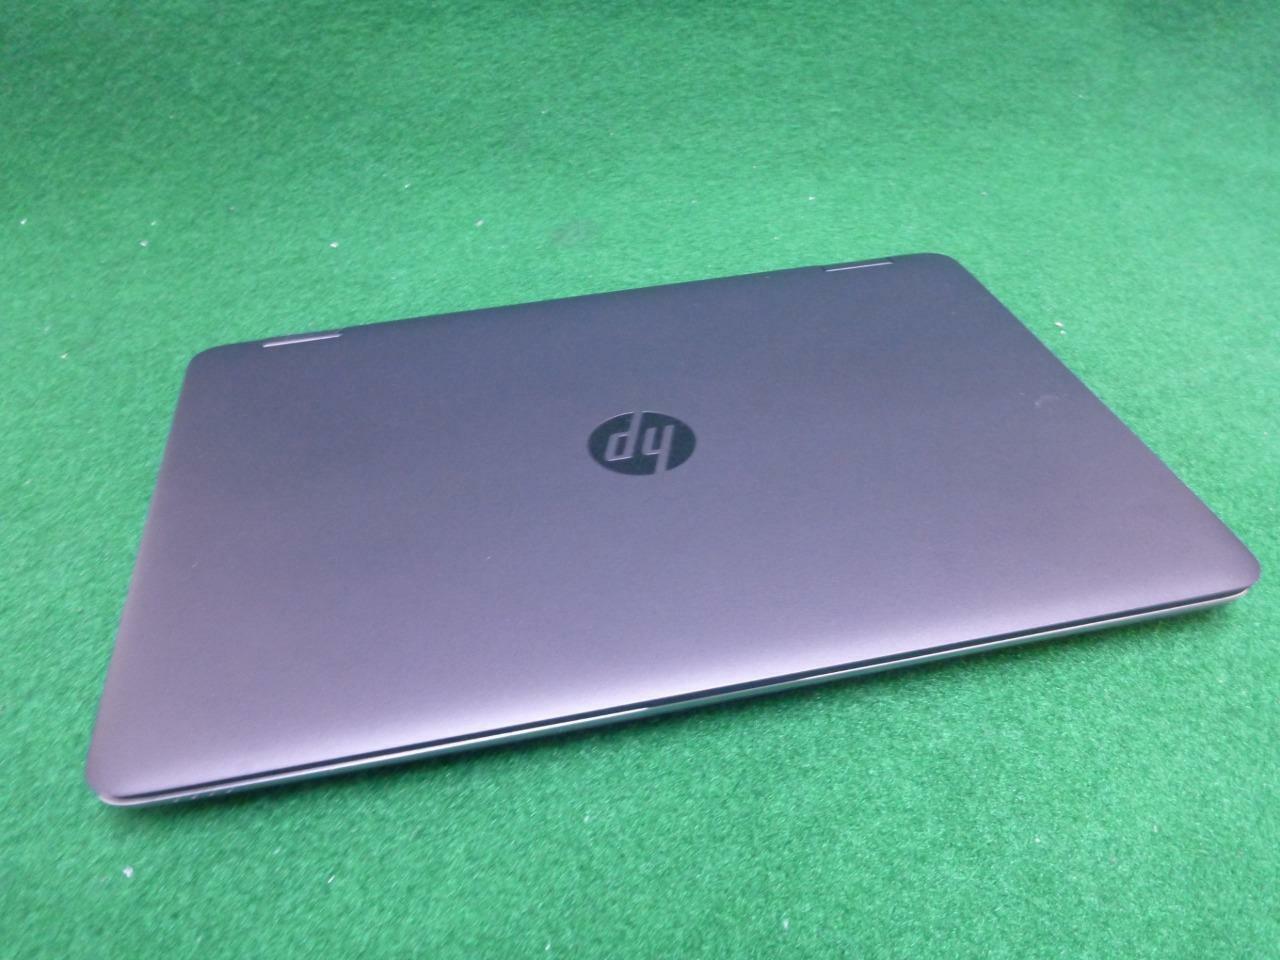 "HP Probook 650 G2 LAPTOP 15.6"" i5-6300U@2.40GHz 8GB RAM 128GB SSD TESTED #1927"